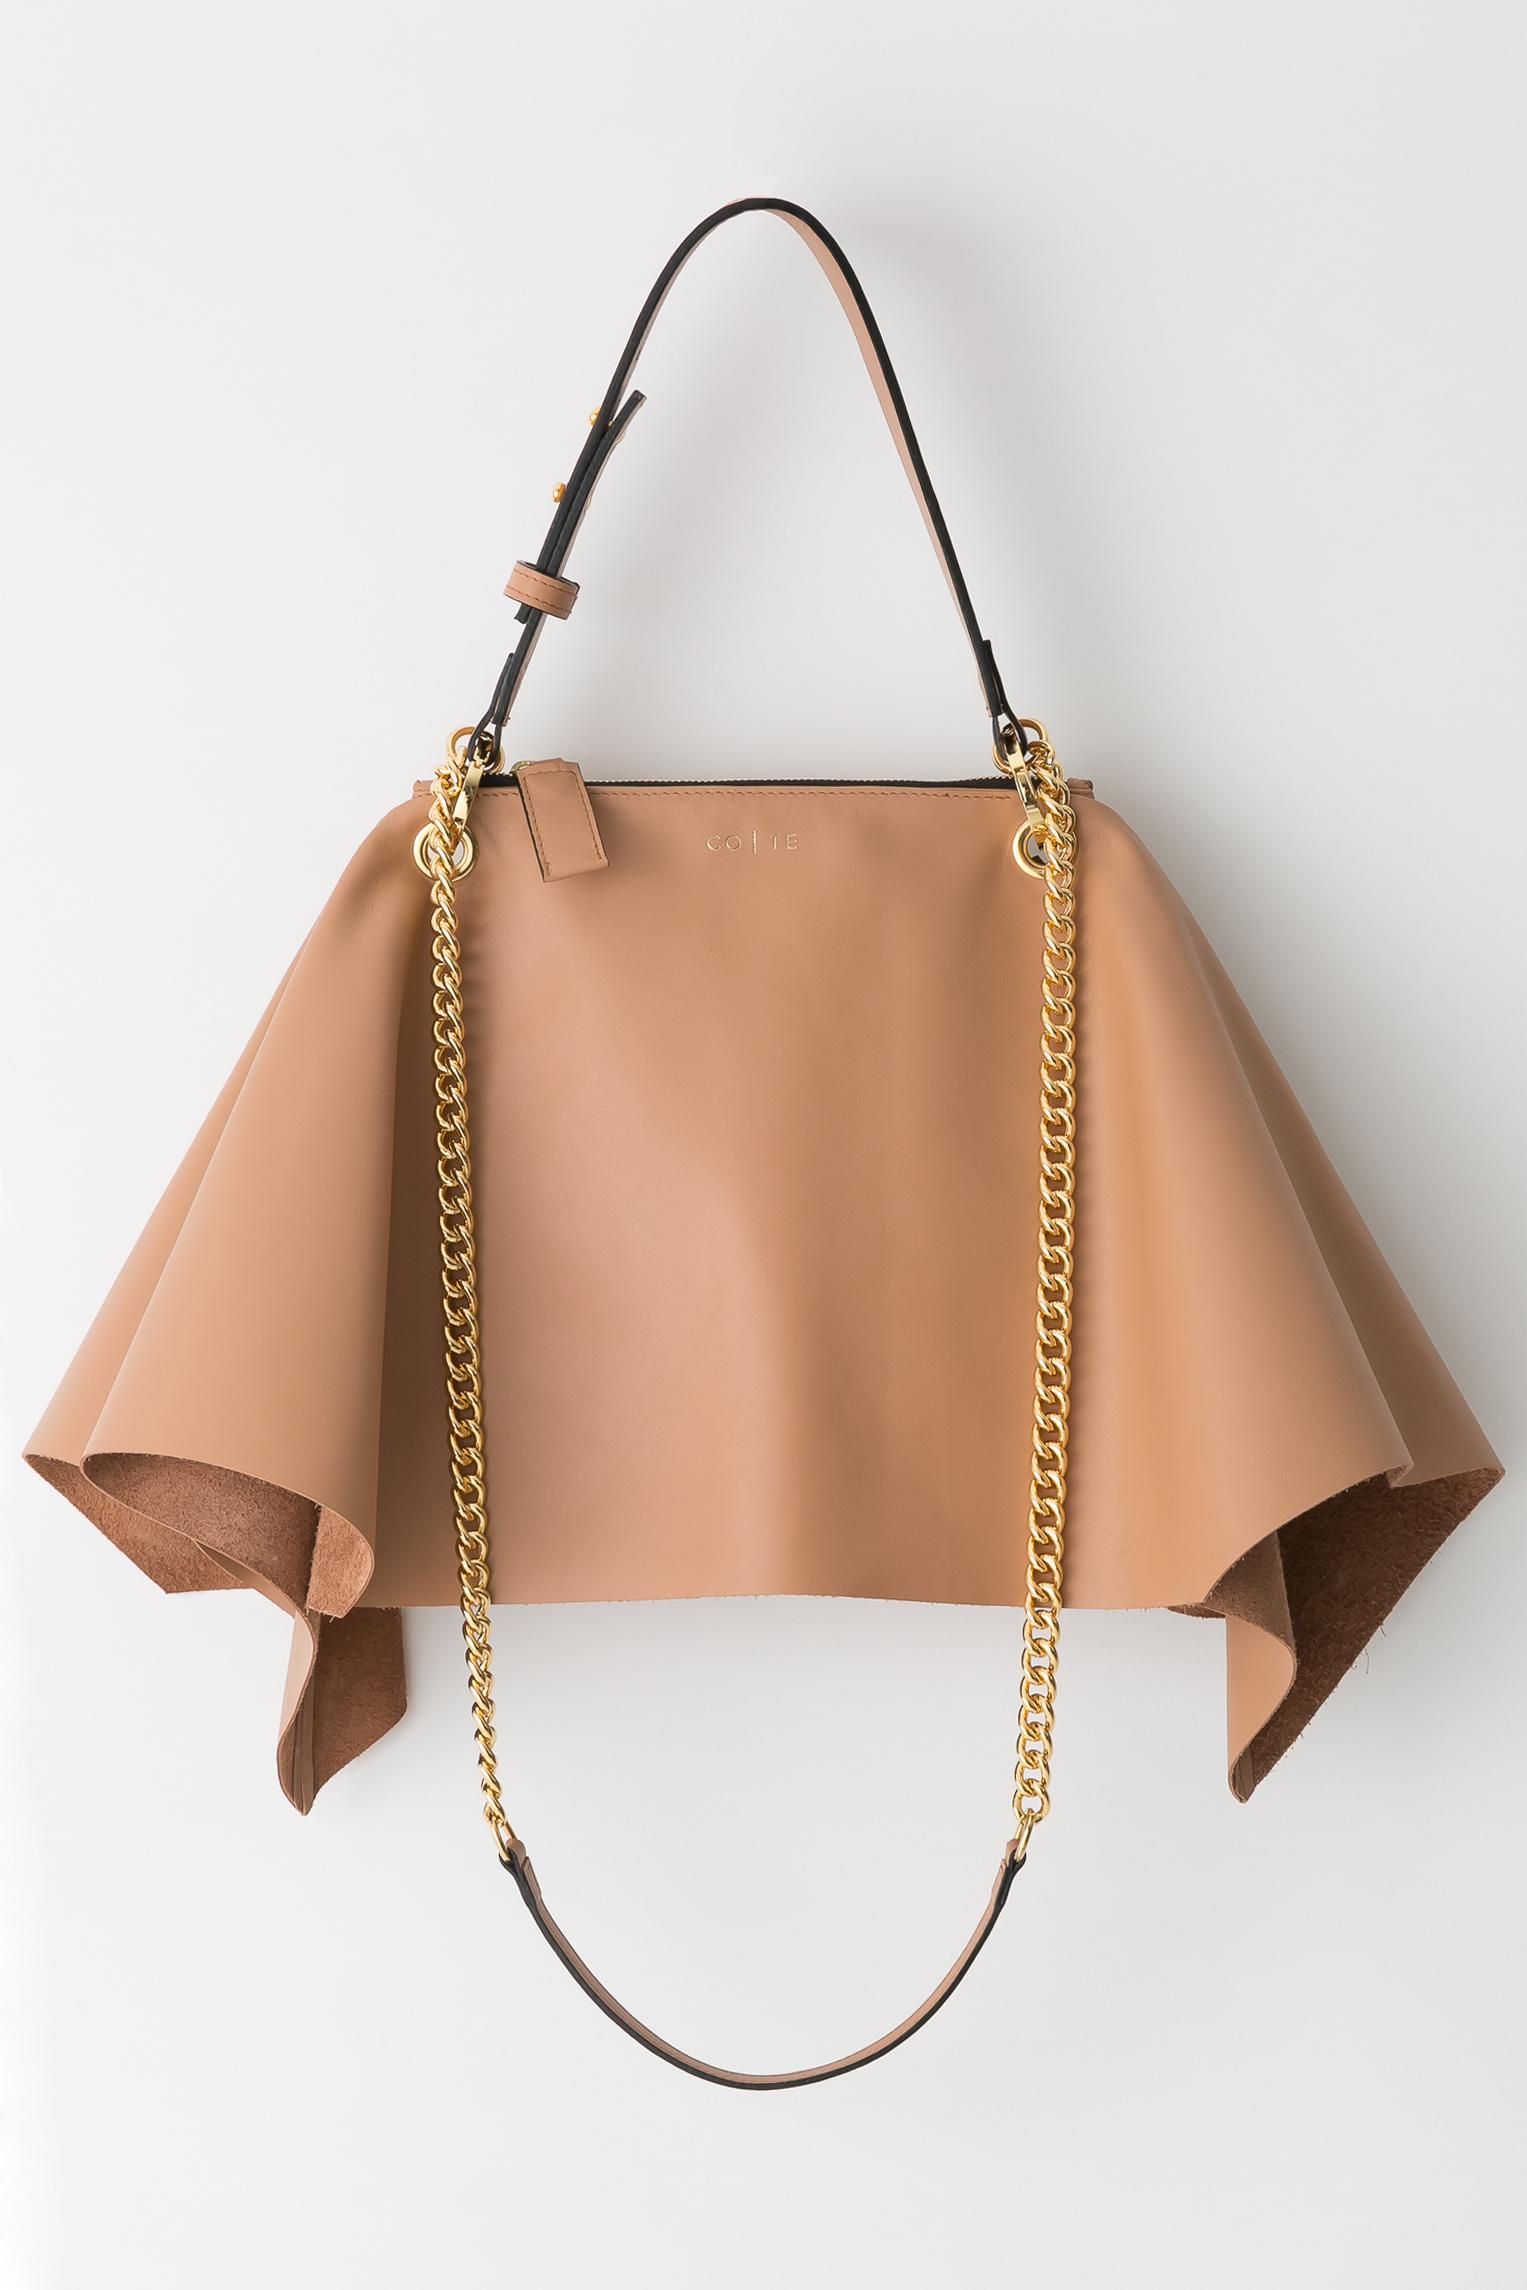 FOULARD BAG nude.jpg